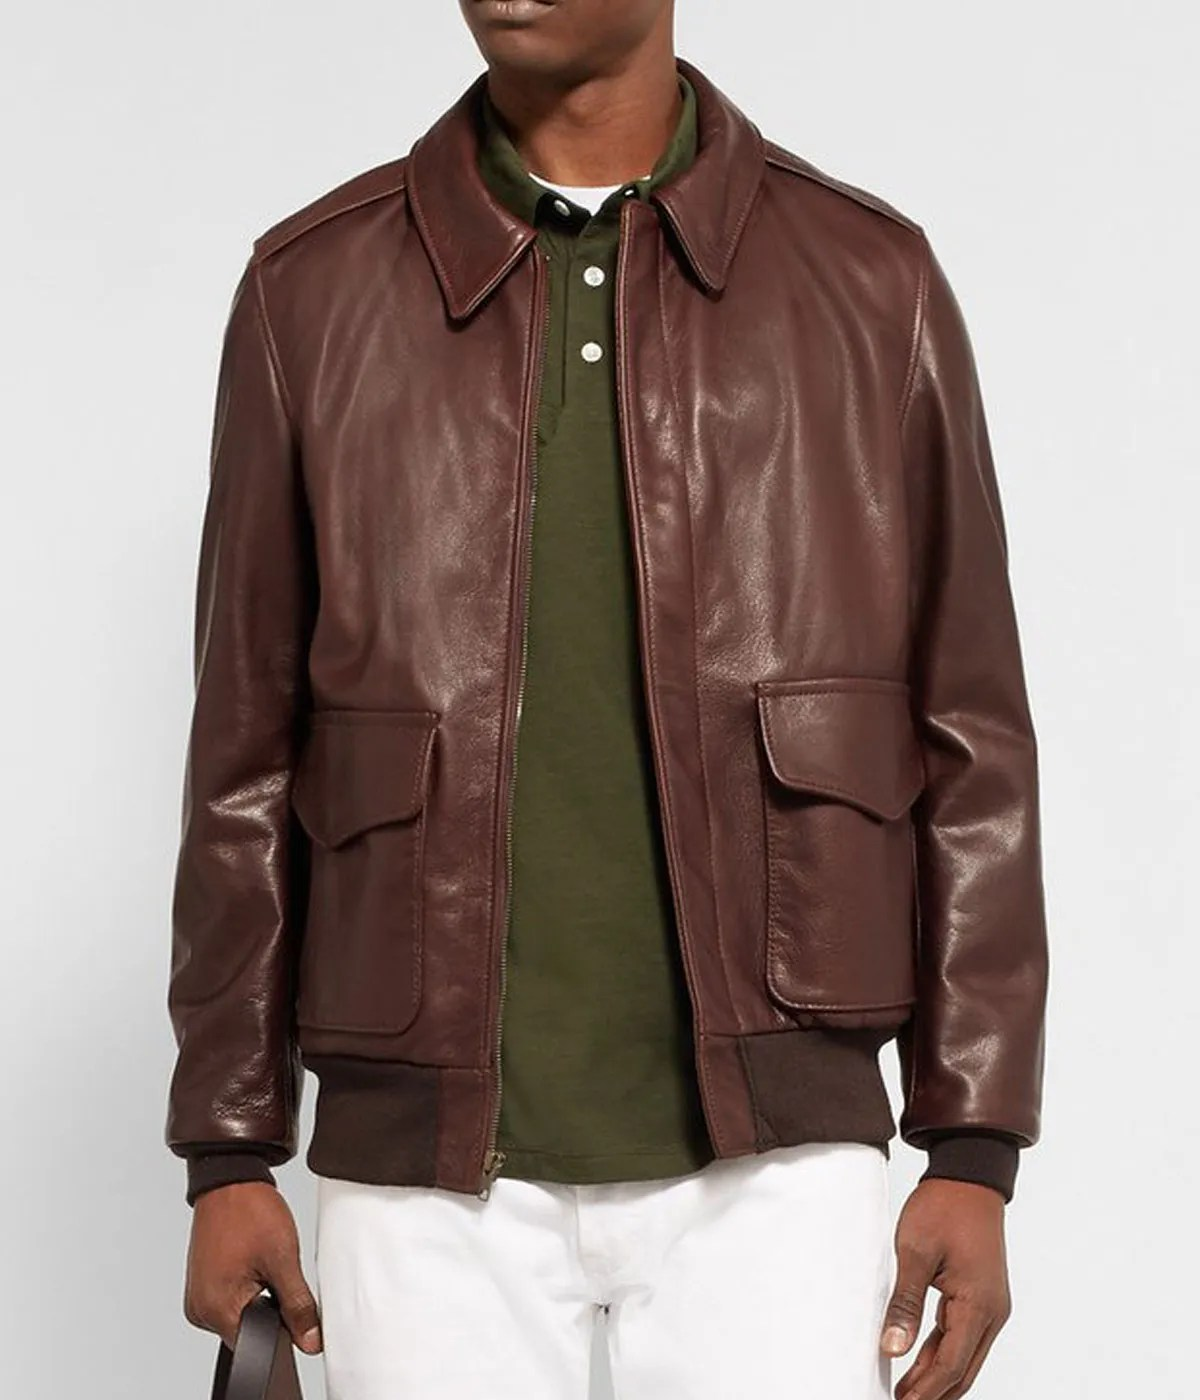 grain-adam-spencer-brown-leather-bomber-jacket